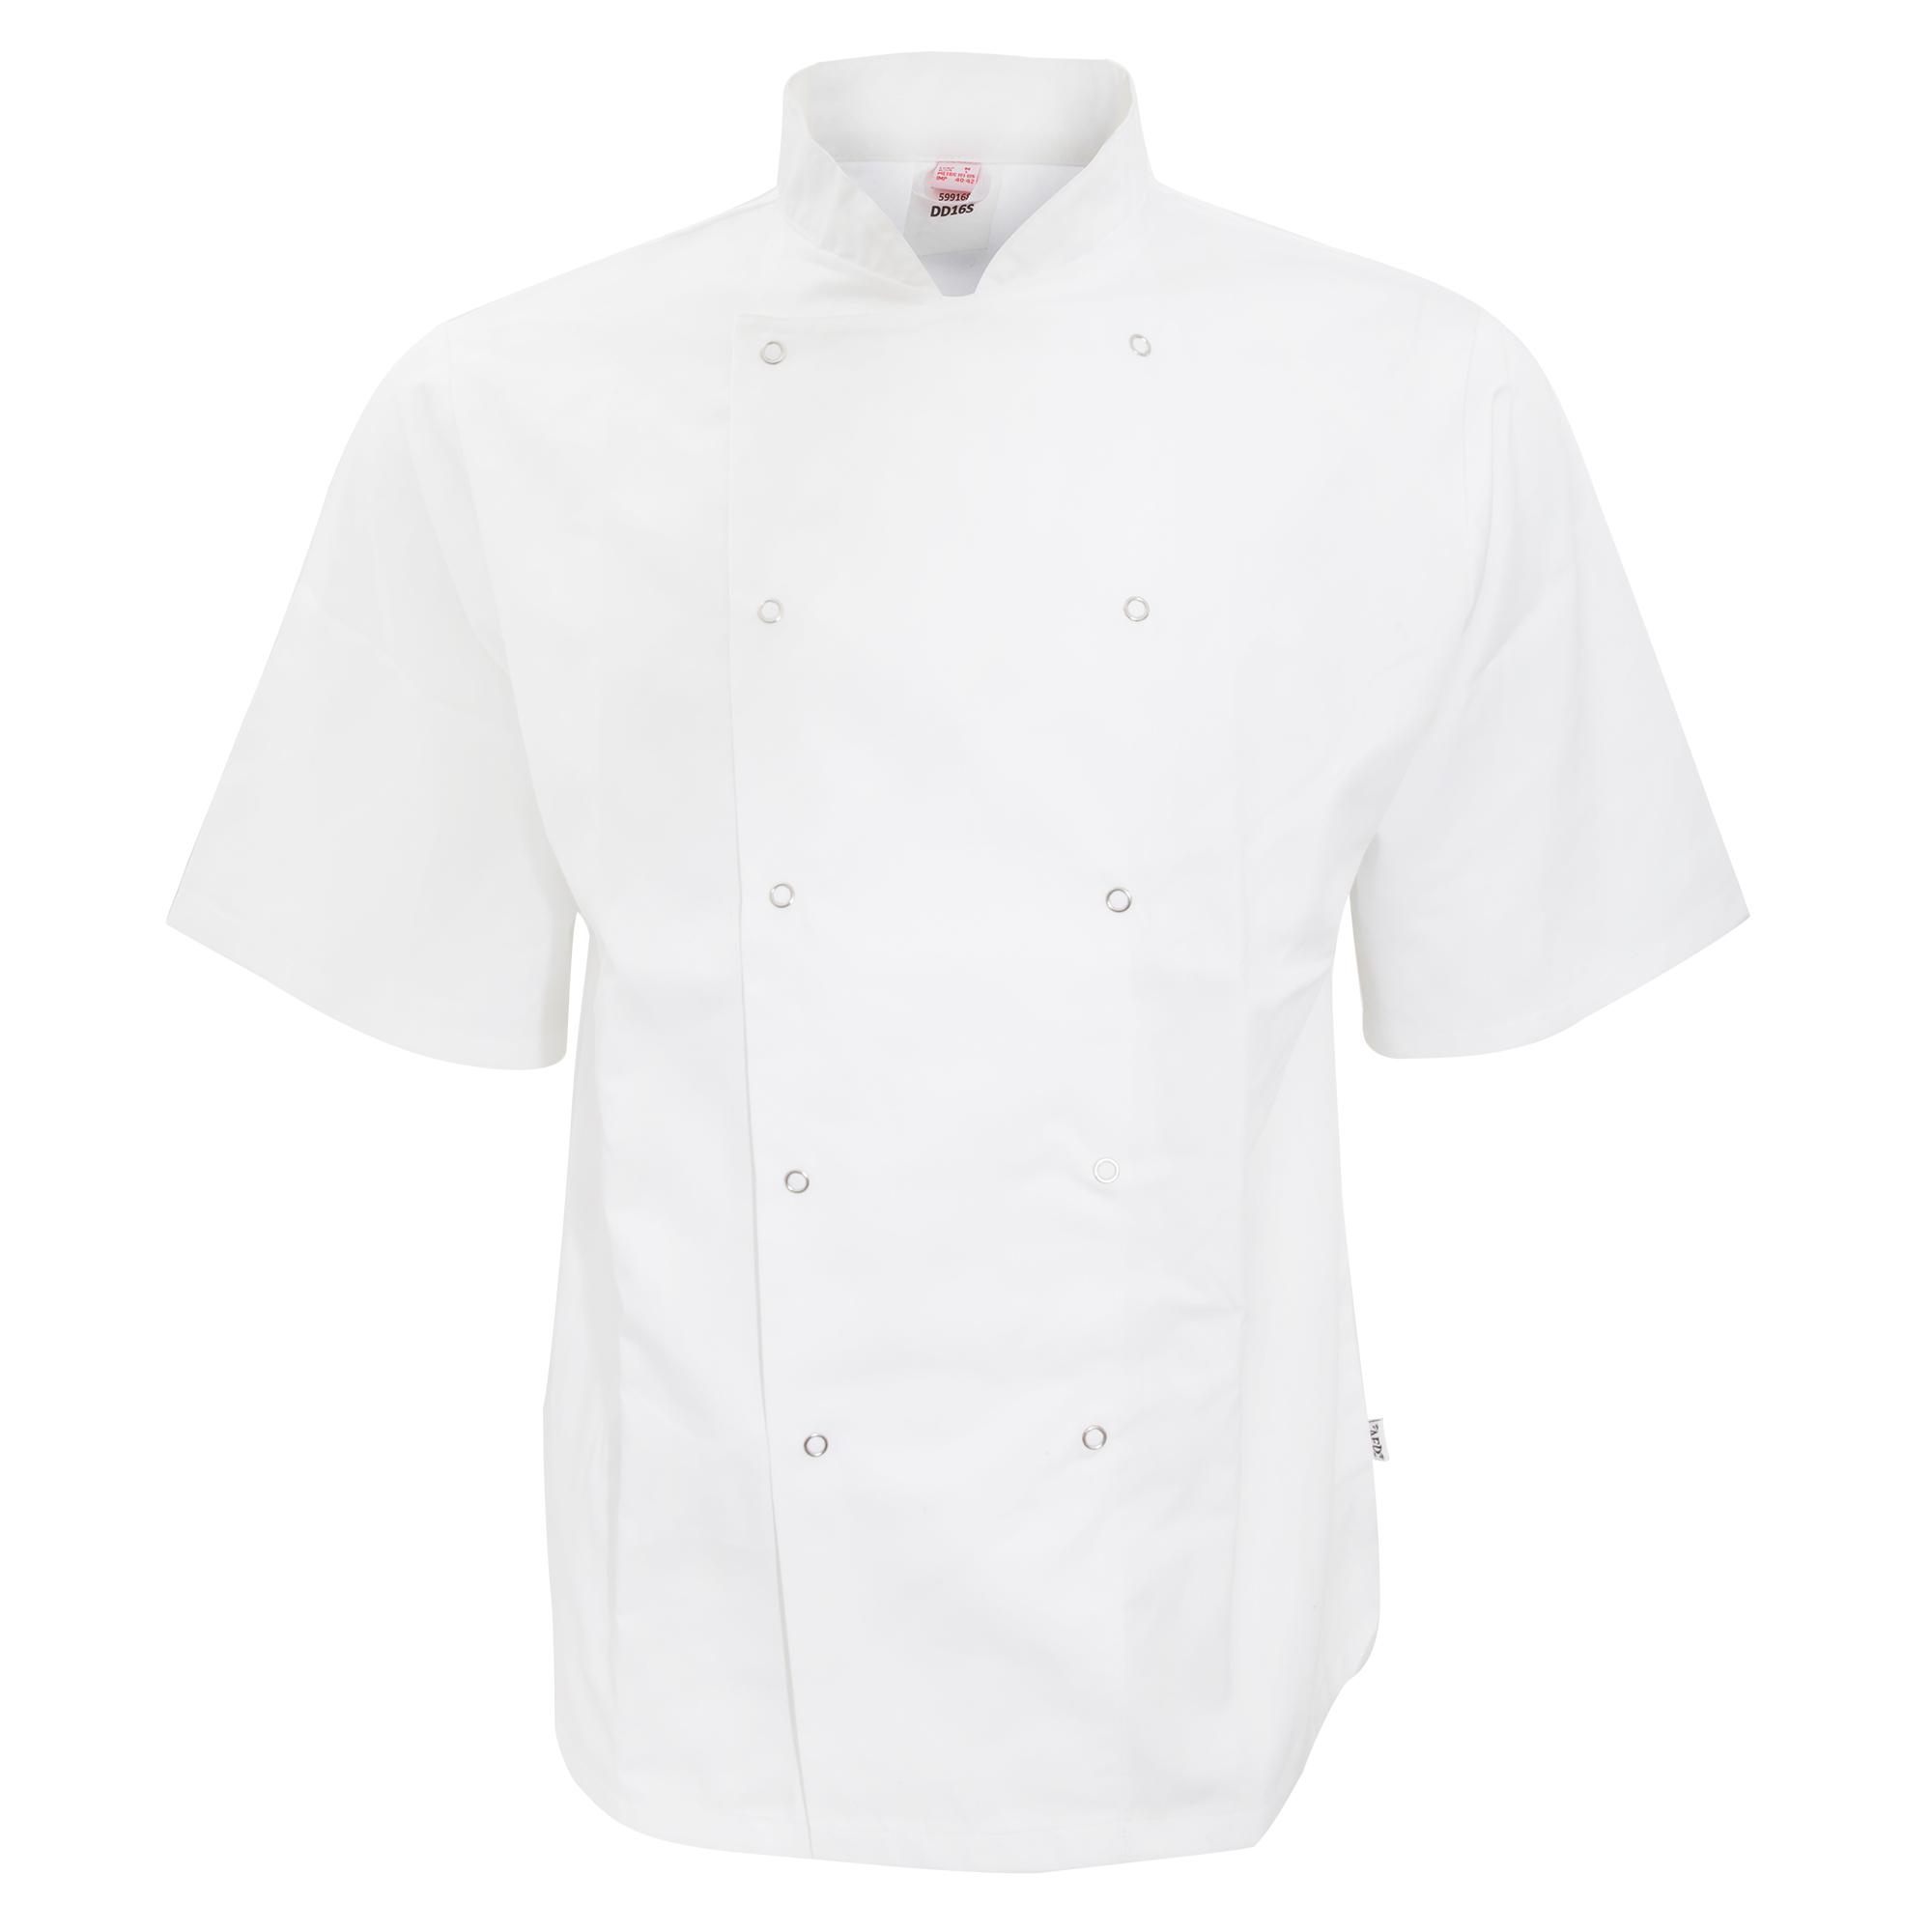 AFD Adults Unisex Short Sleeve Chefs Jacket (XL) (White)